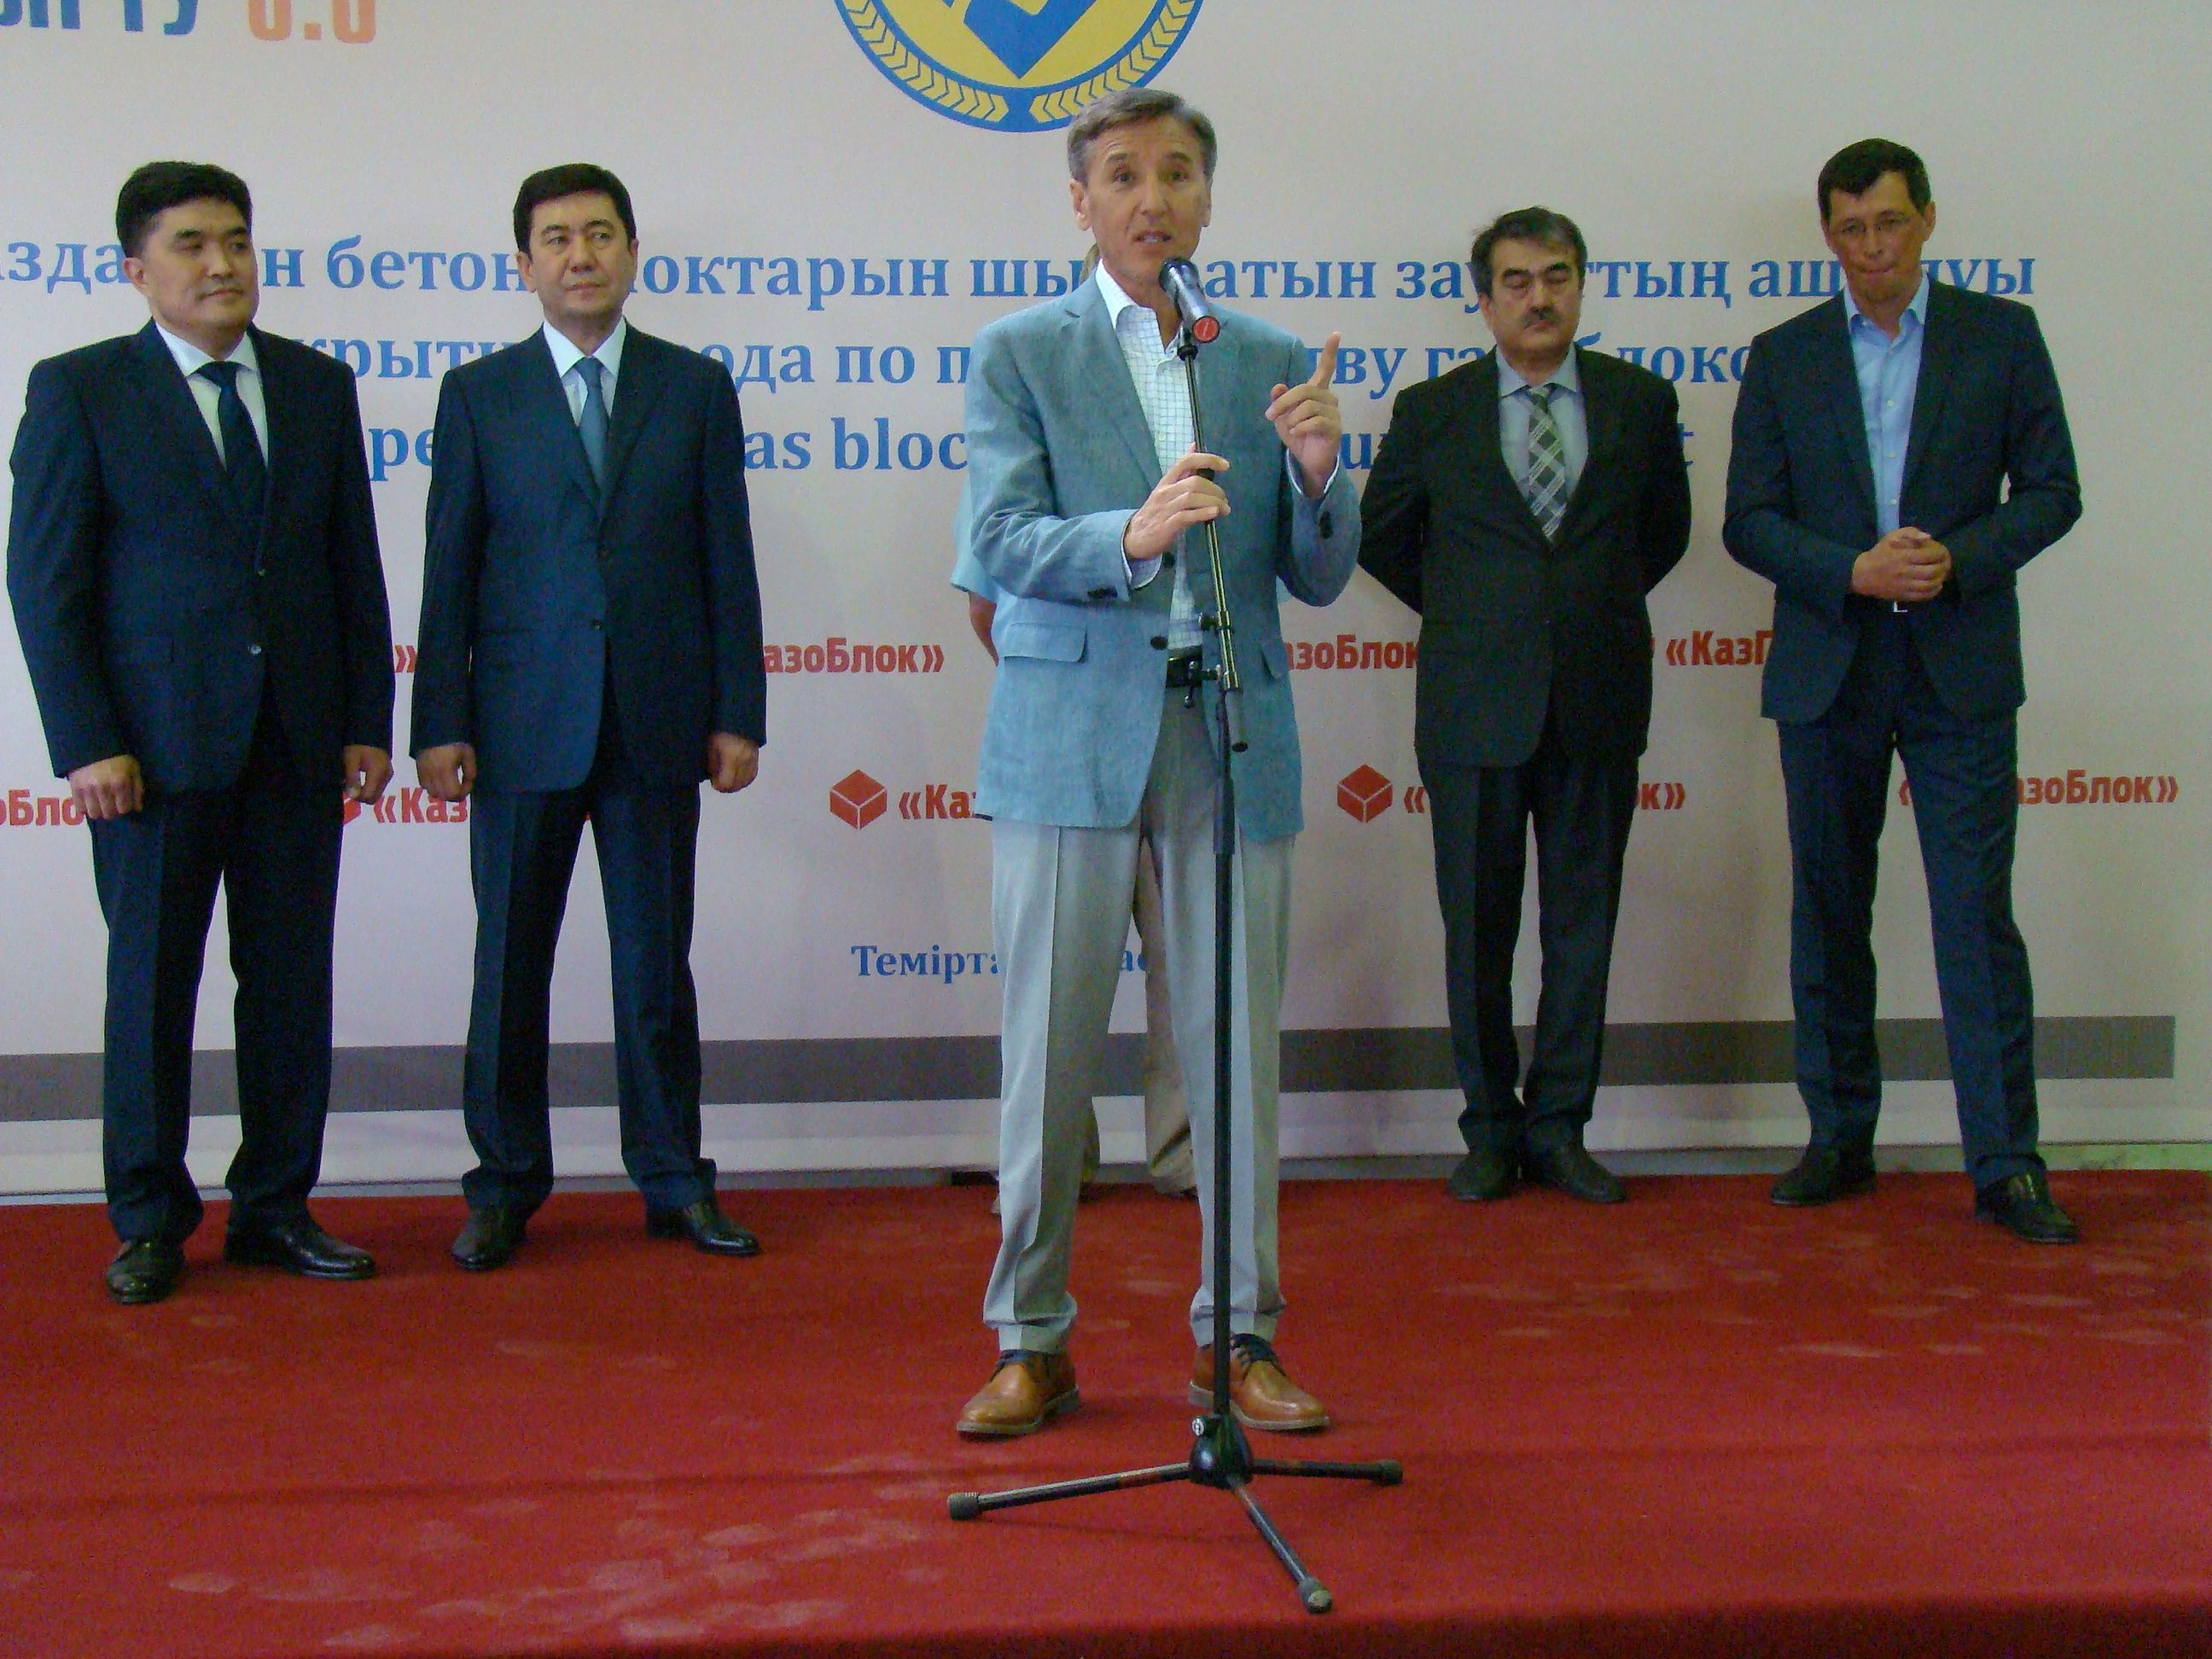 https://inbusiness.kz/ru/images/original/1/images/oRgMpjfR.jpg